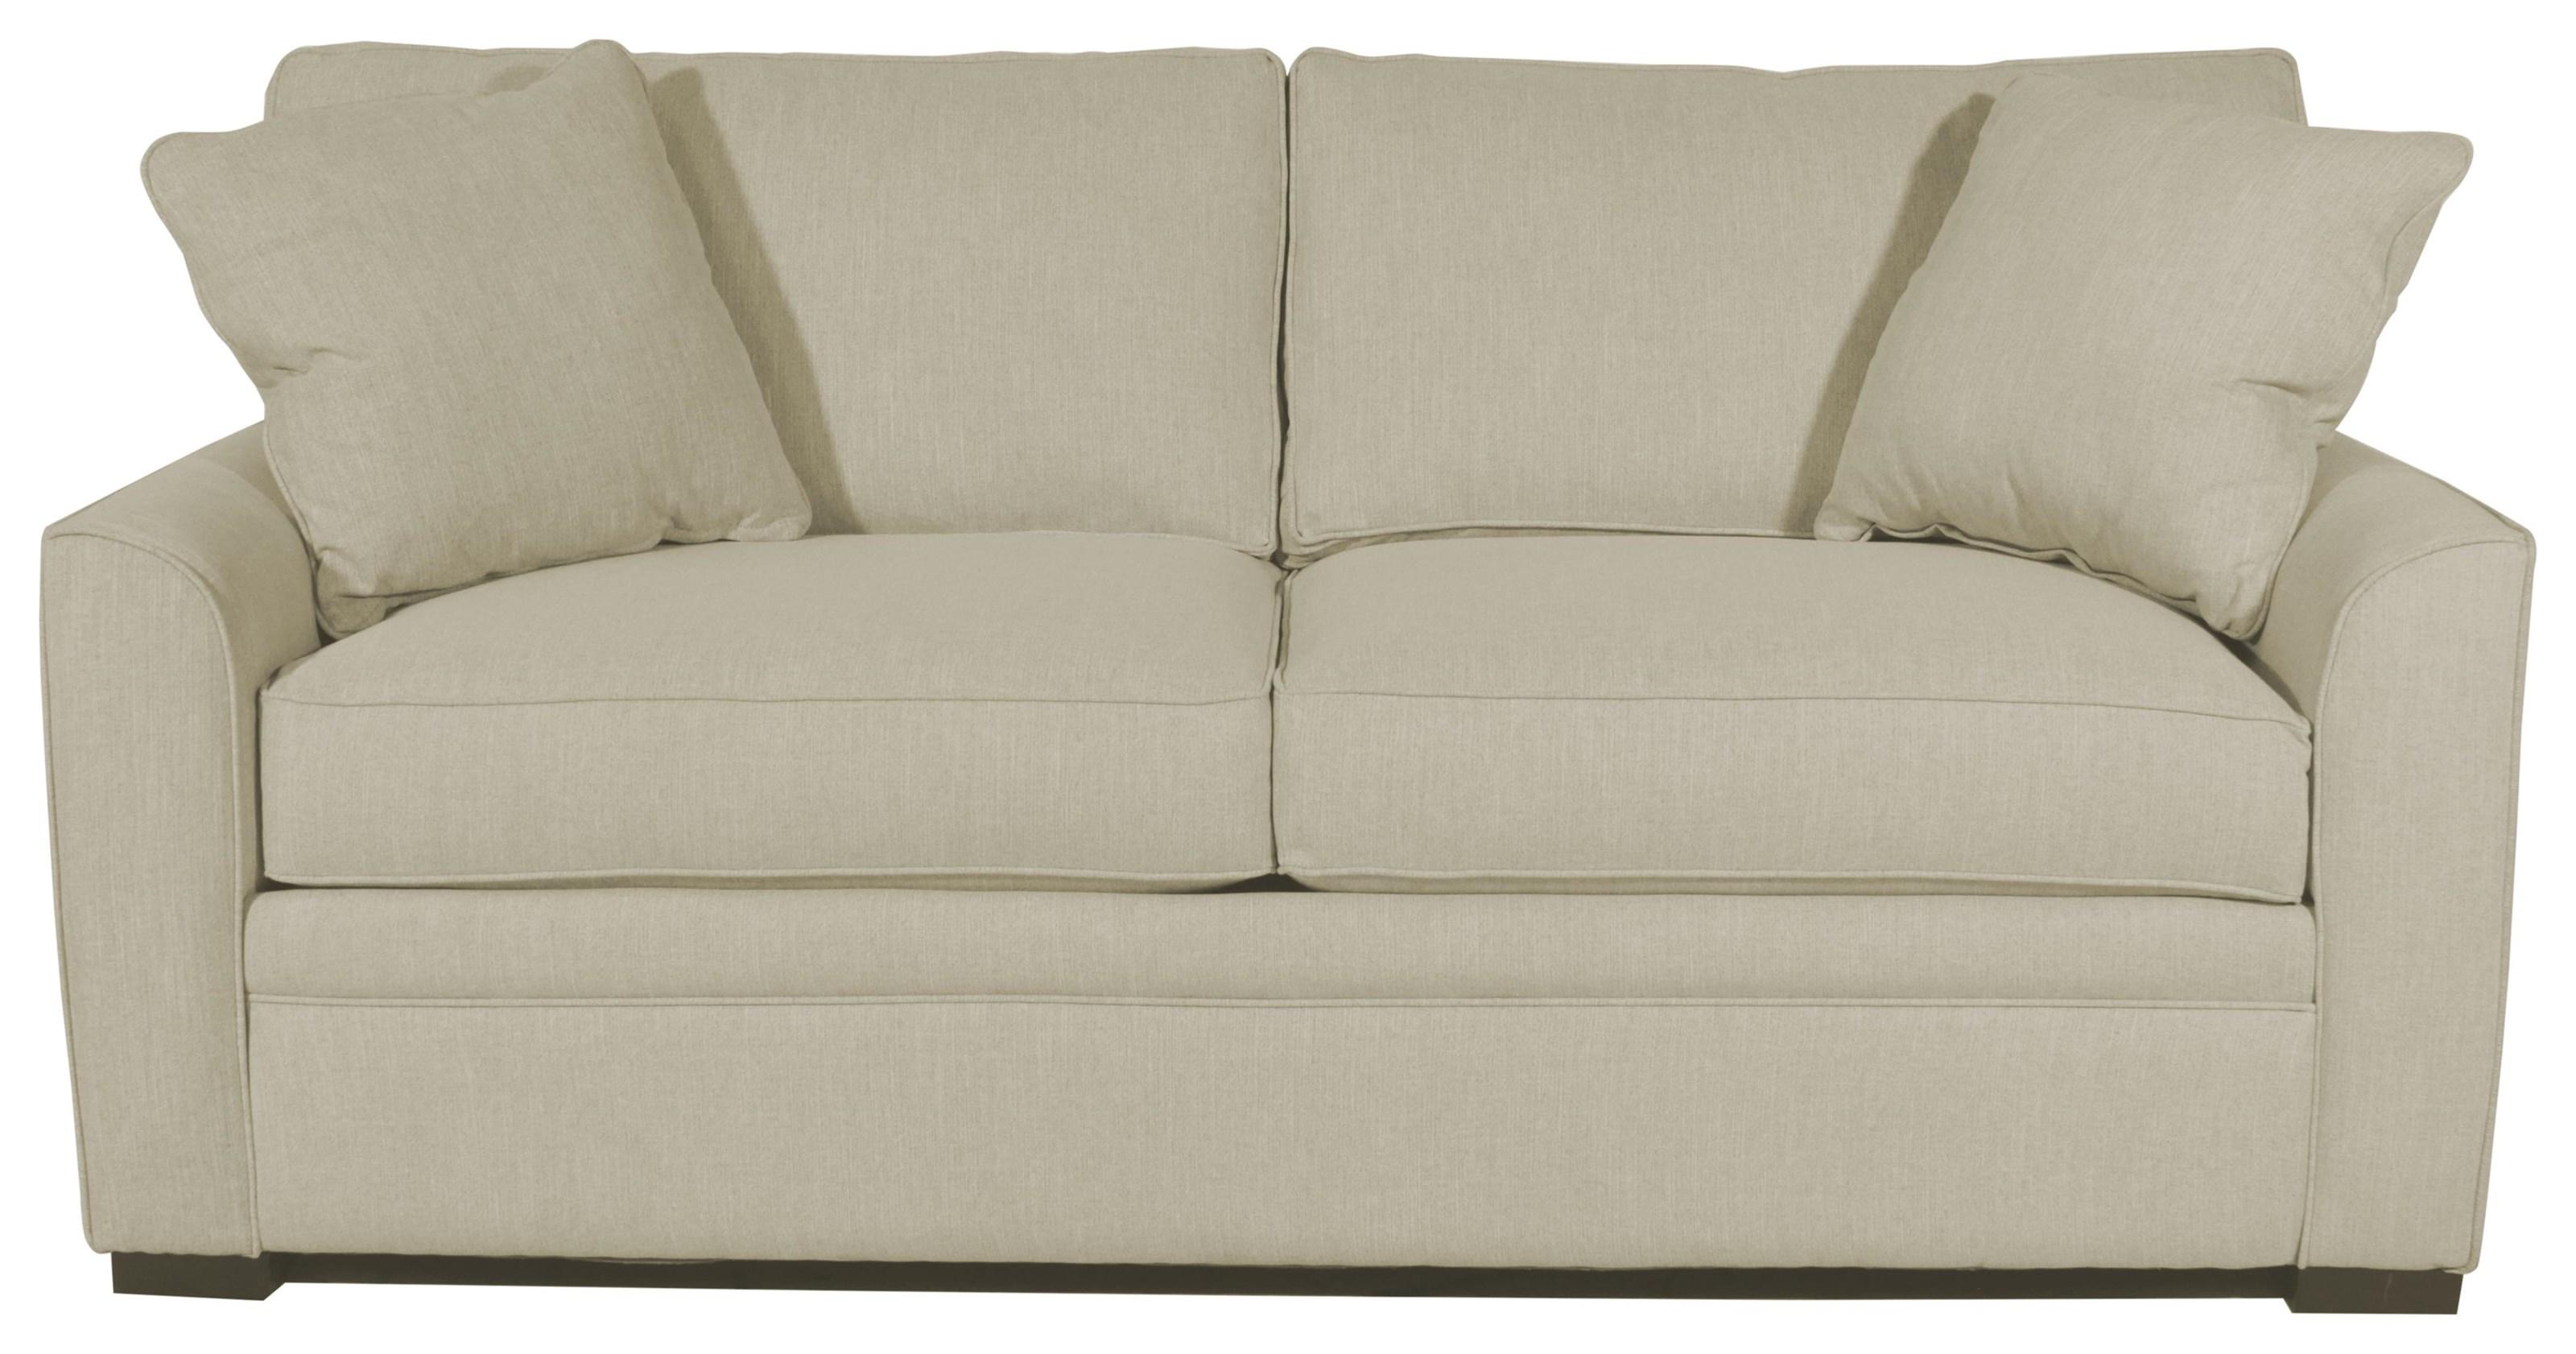 Blissful Full Sofa Sleeper by Jonathan Louis at HomeWorld Furniture